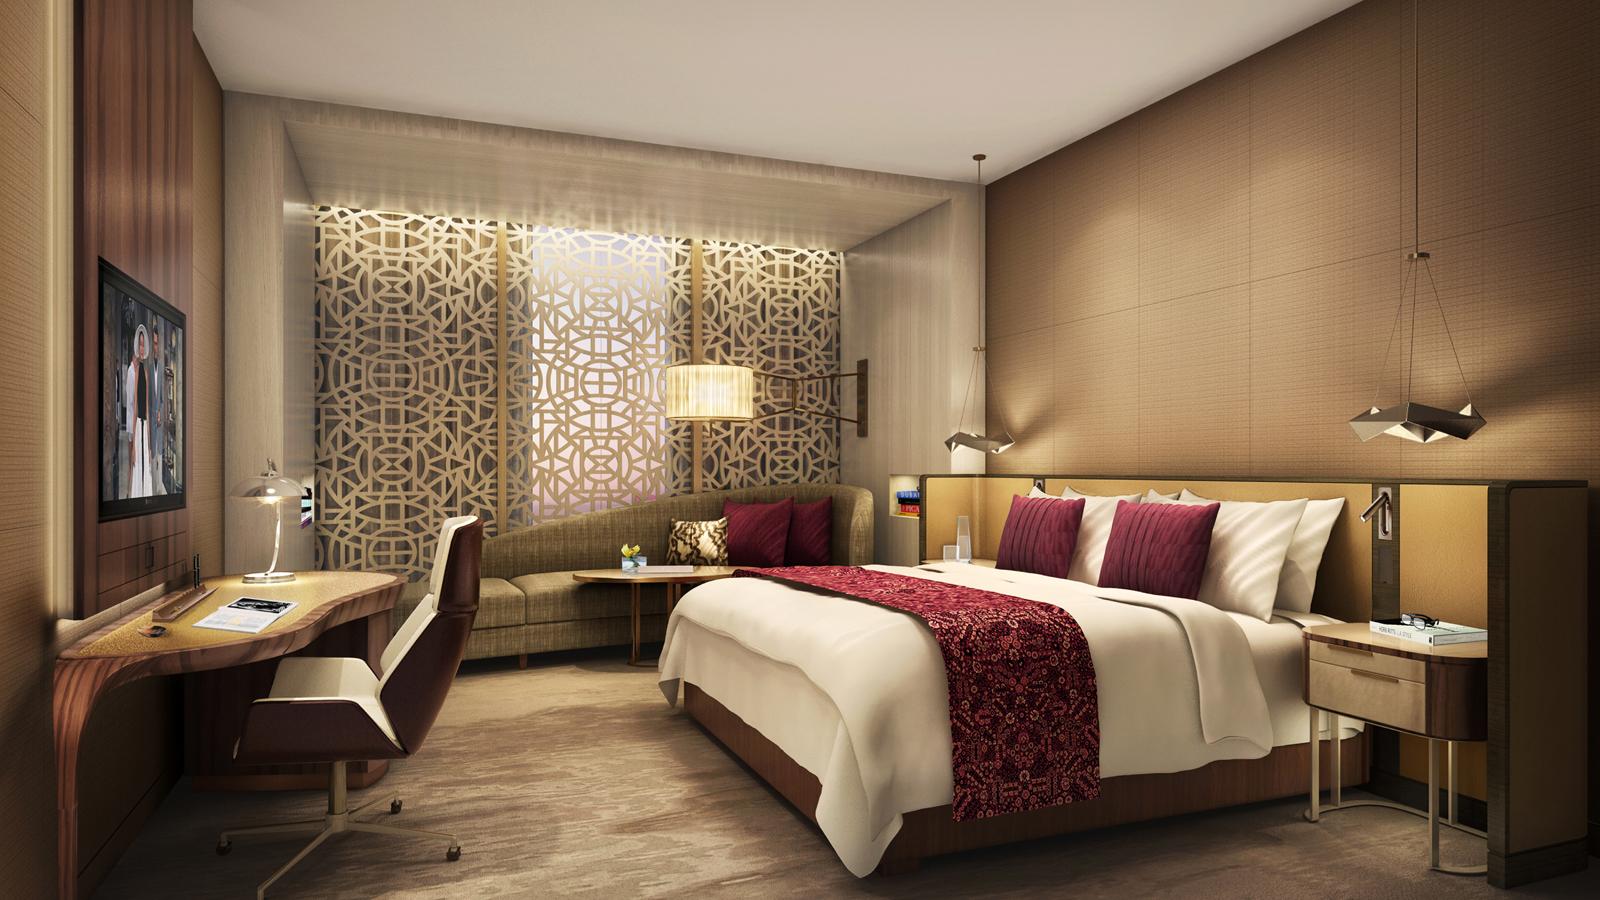 Now accepting reservations four seasons hotel dubai for International decor dubai